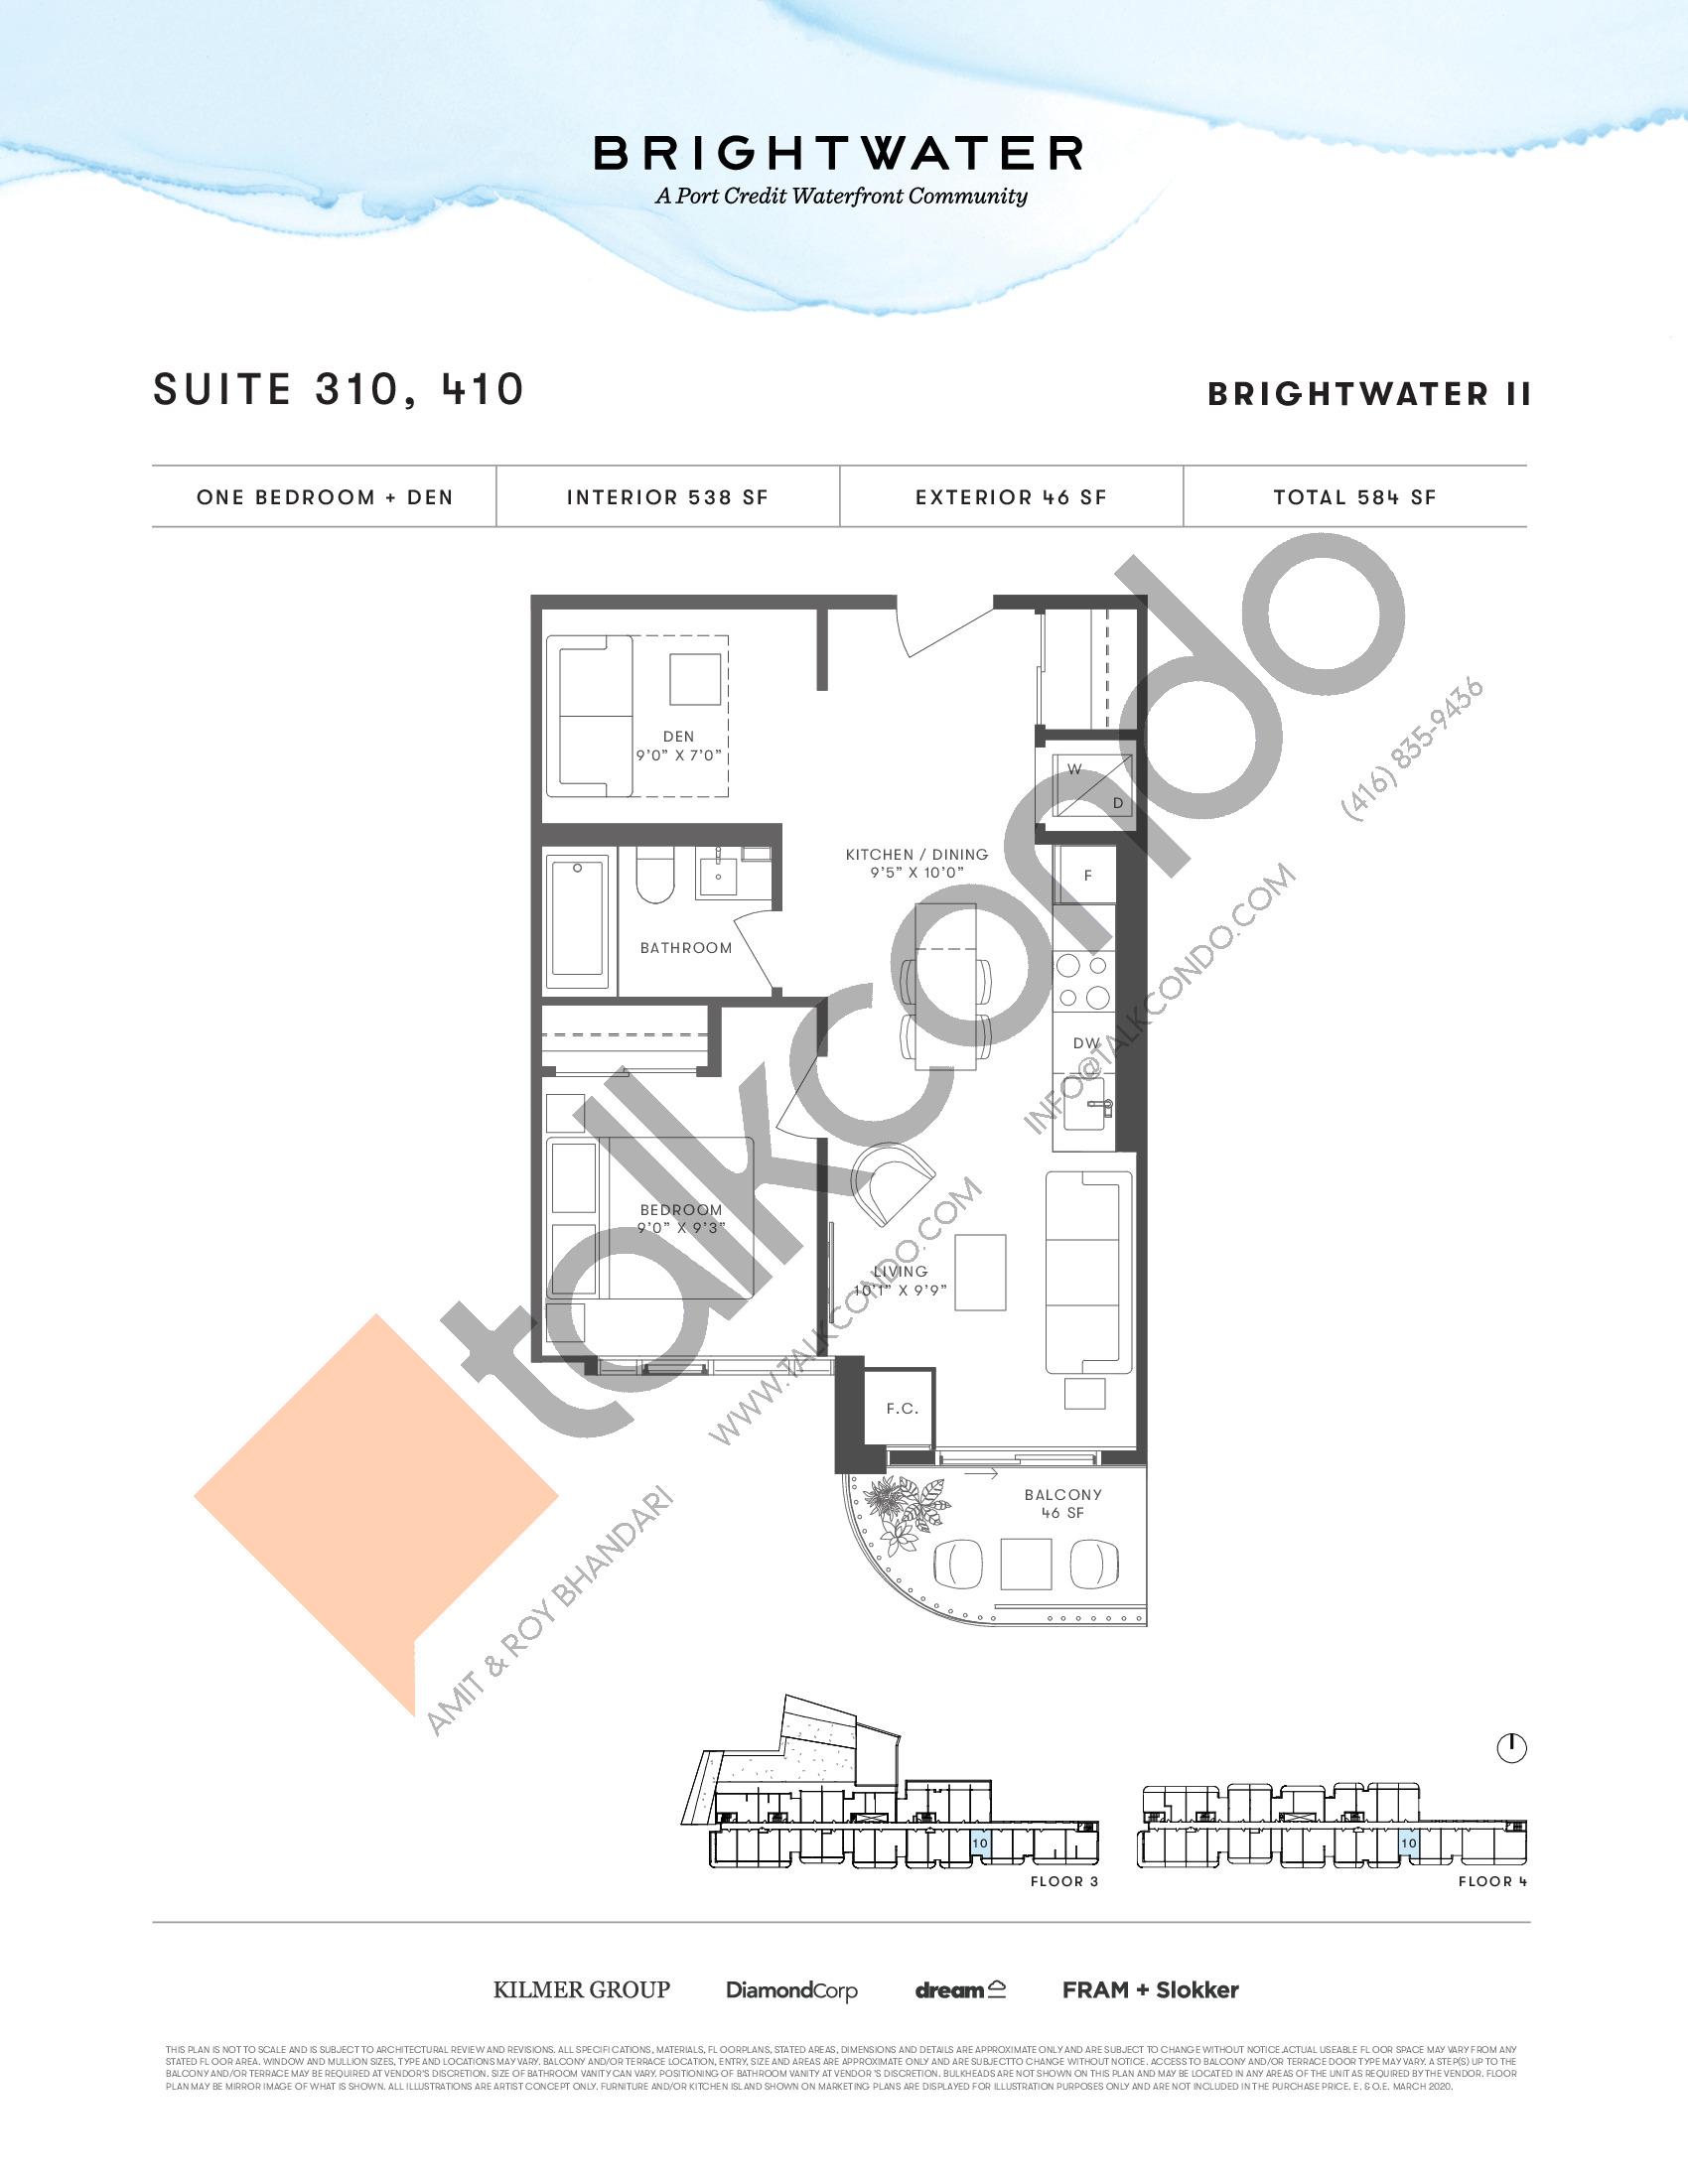 Suite 310, 410 Floor Plan at Brightwater II Condos - 538 sq.ft